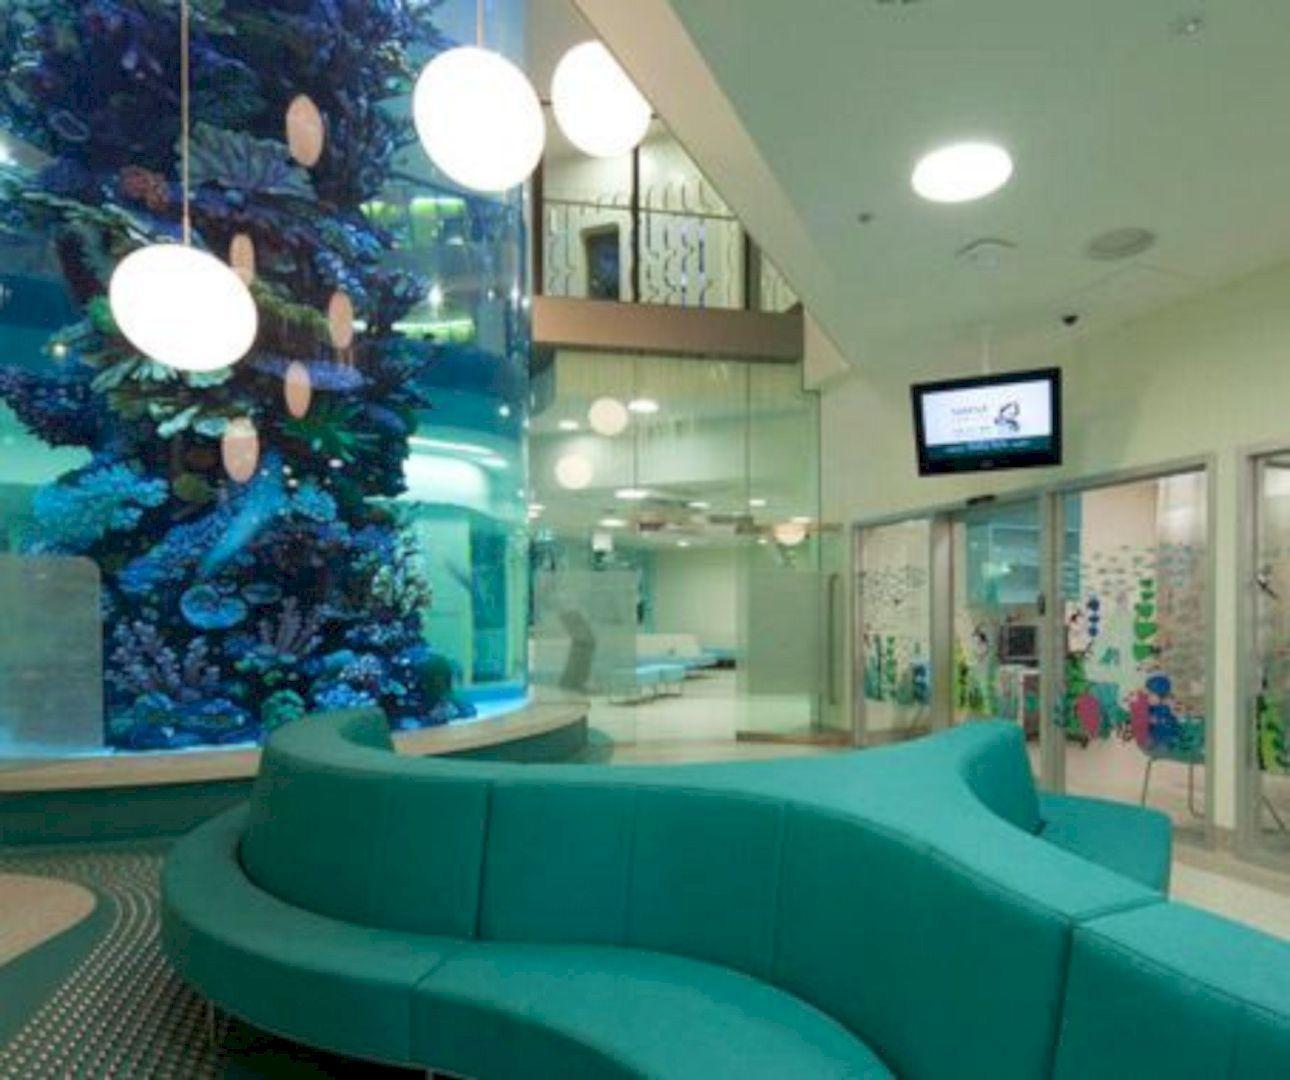 17 Interior Design Ideas to Make a Dental Clinic Less